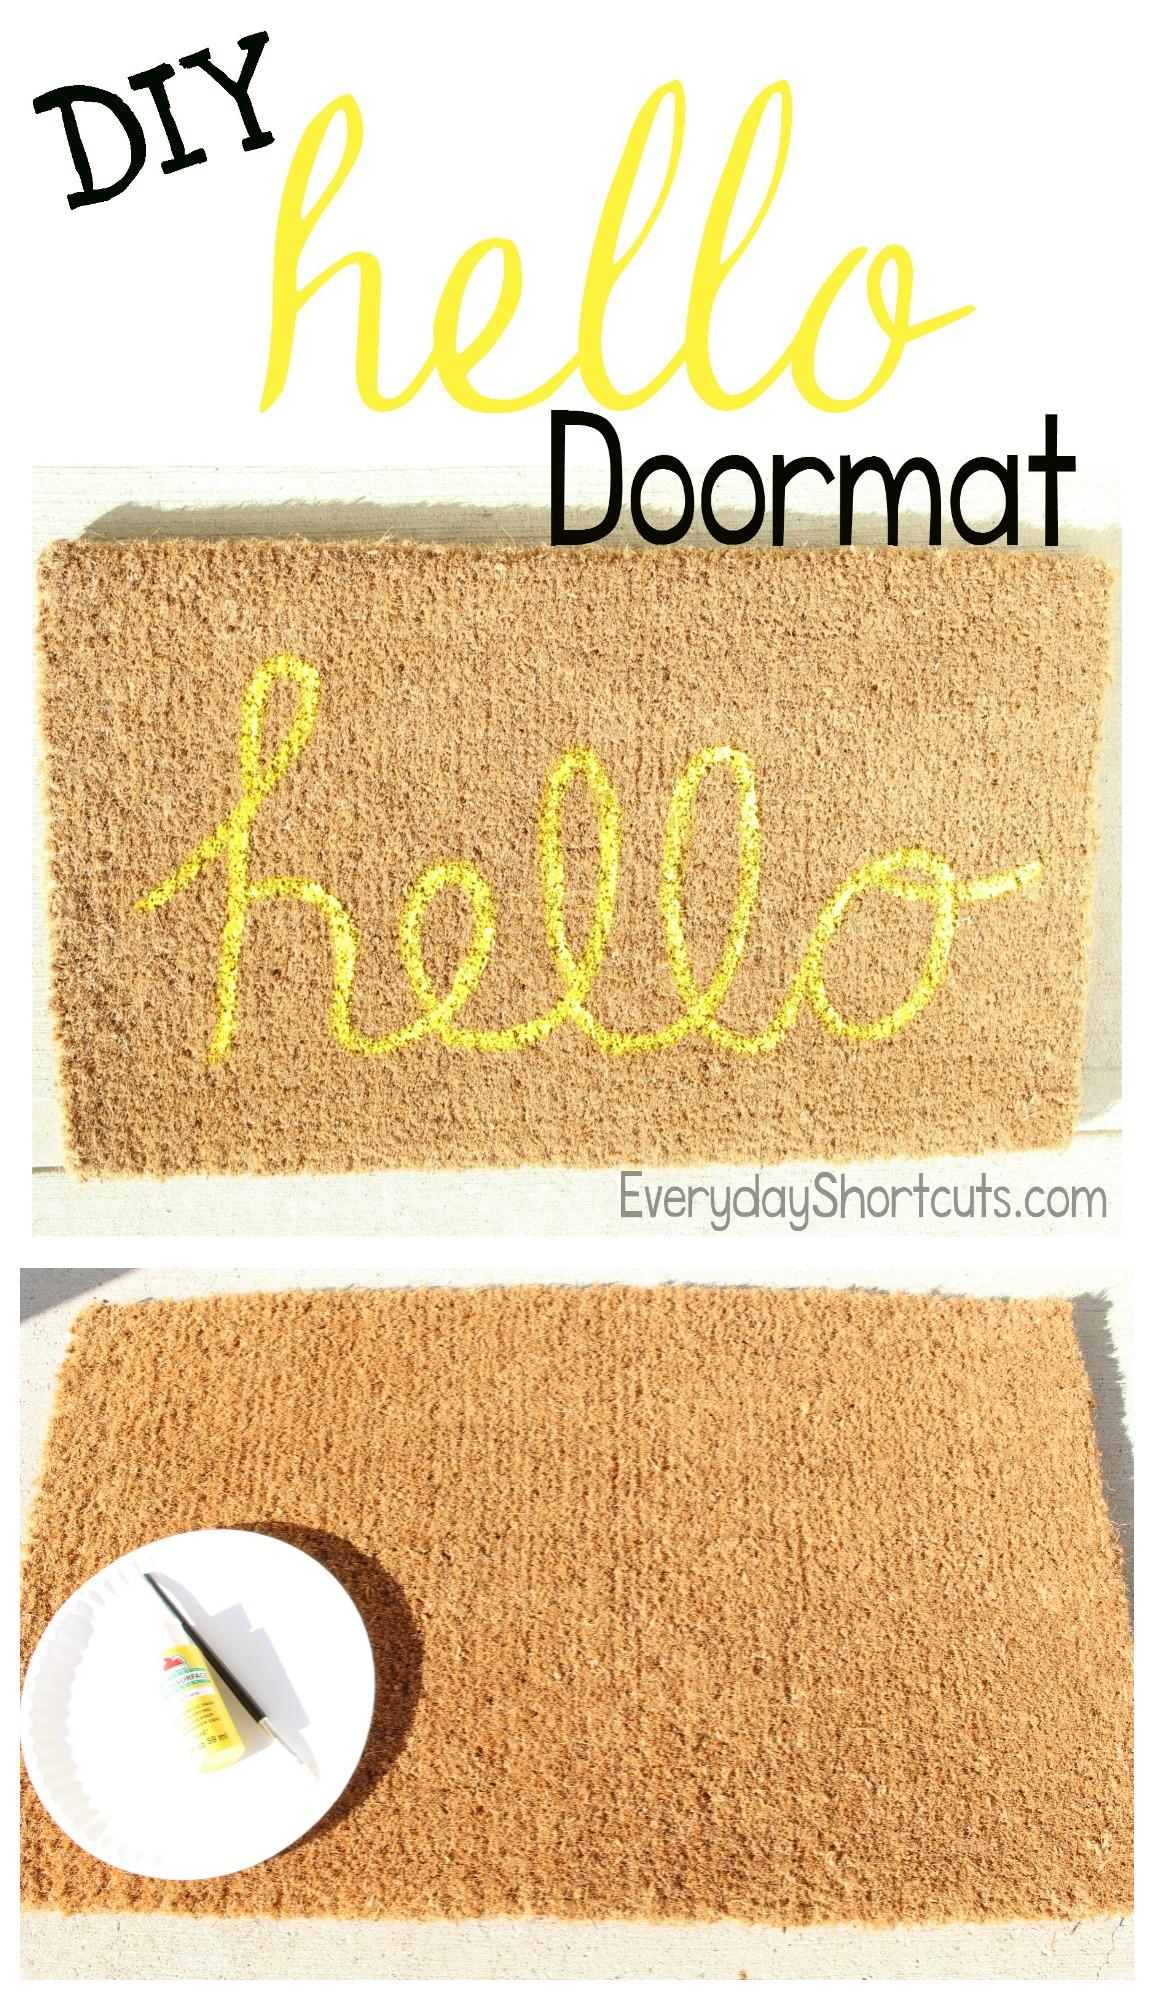 diy hello saying doormat